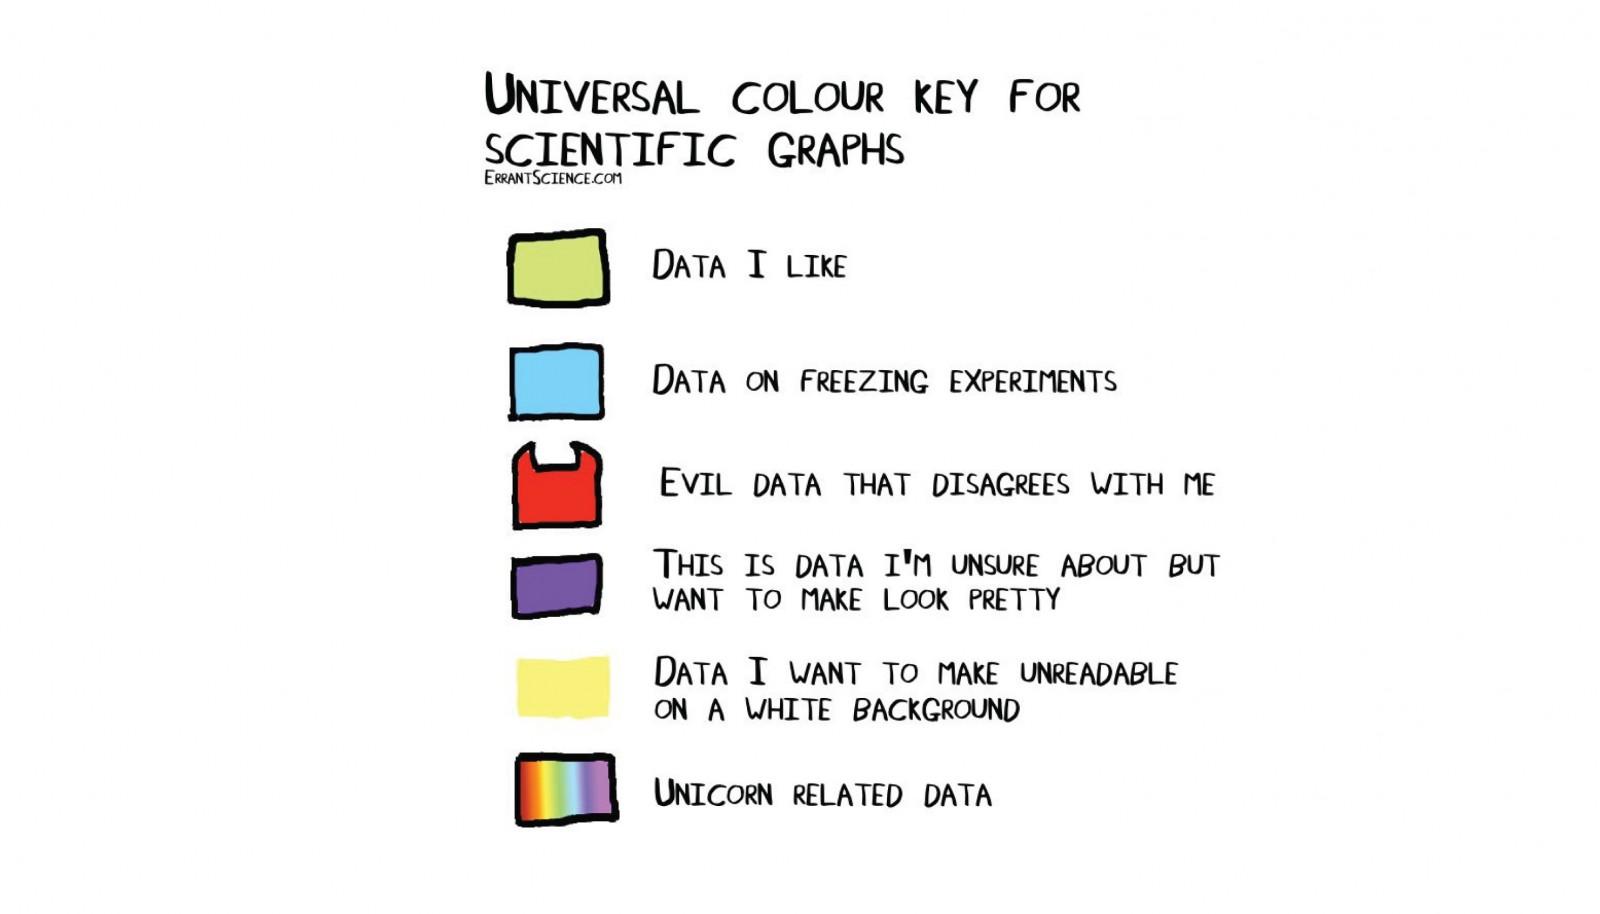 Geodynamics The Rainbow Colour Map Repeatedly Considered Harmful